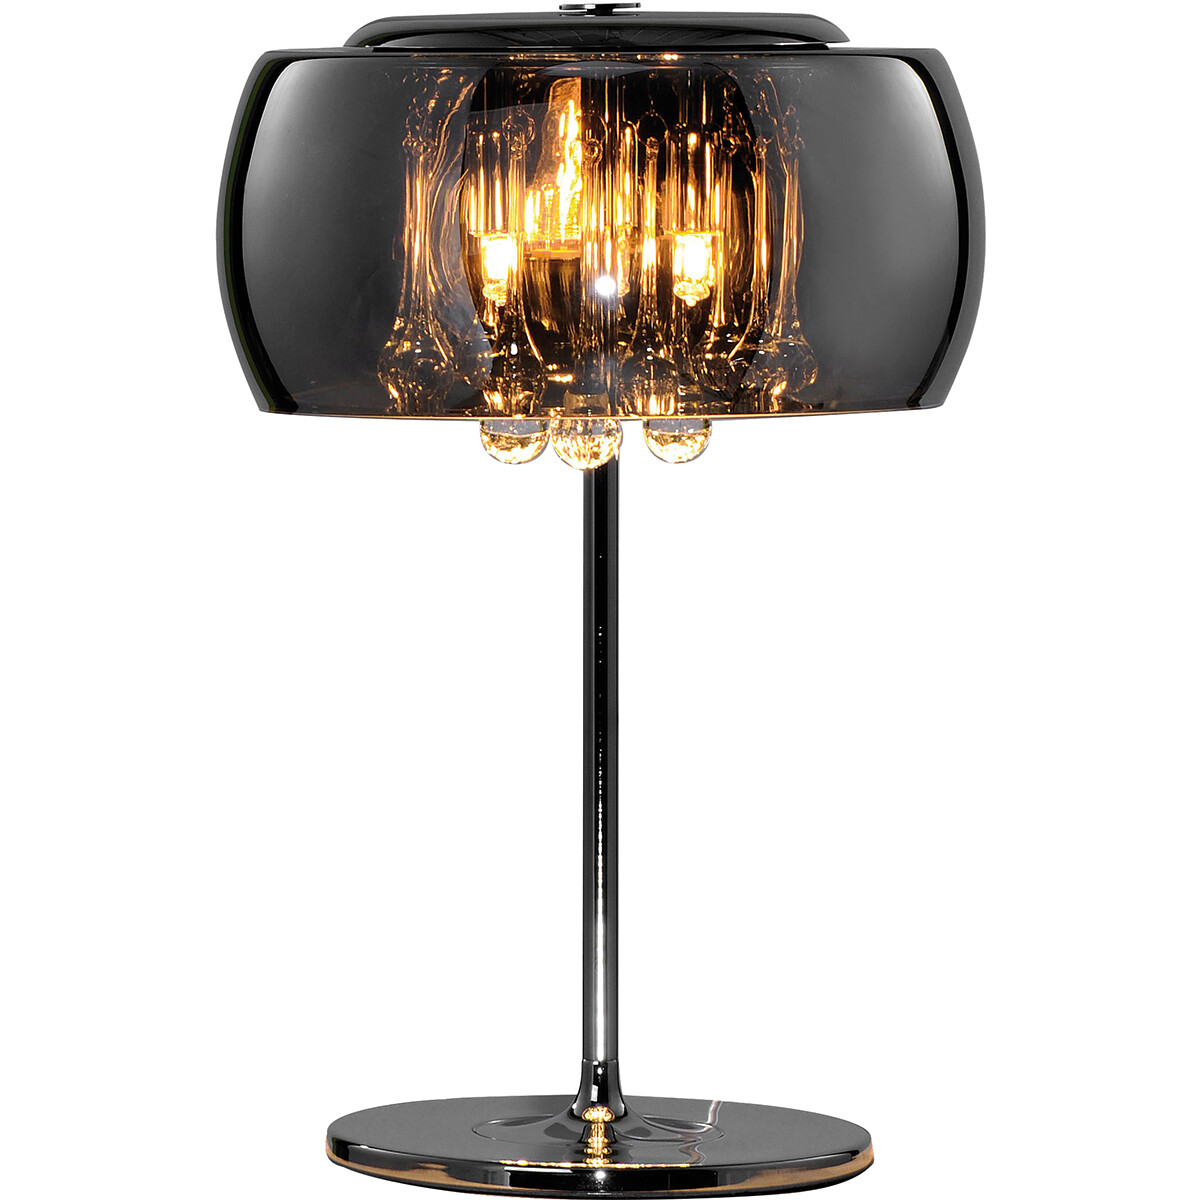 LED Tafellamp - Tafelverlichting - Trion Vapiro - G9 Fitting - Rond - Mat Chroom - Aluminium